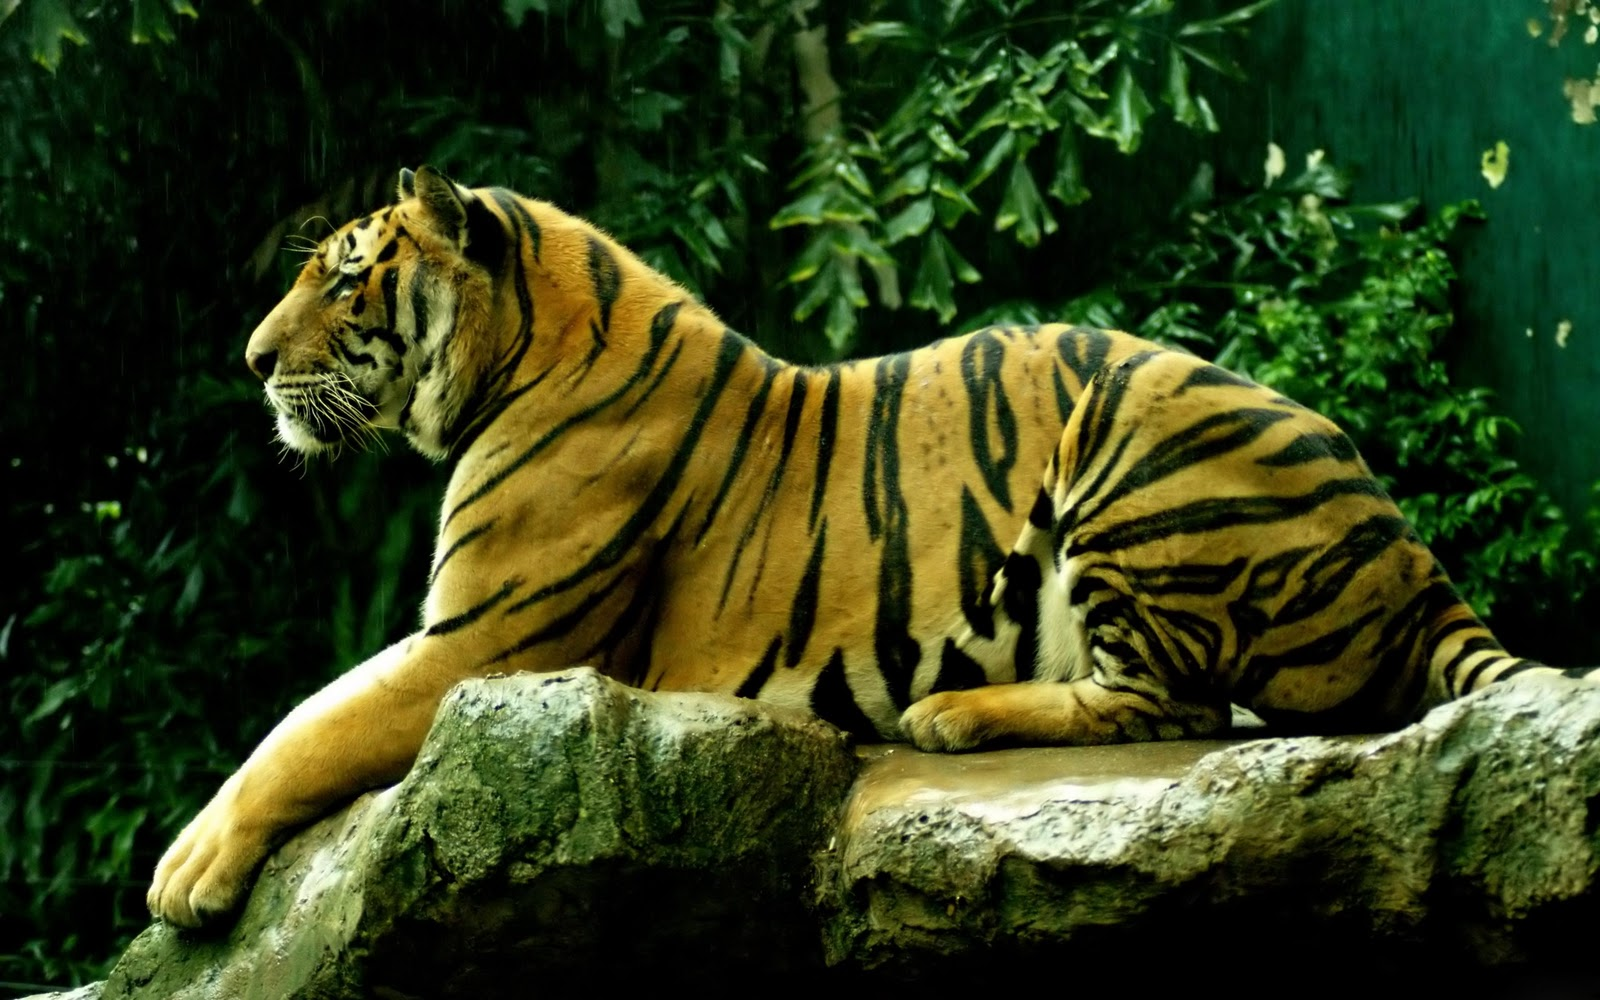 Best Desktop HD Wallpaper: Tiger HD wallpapers